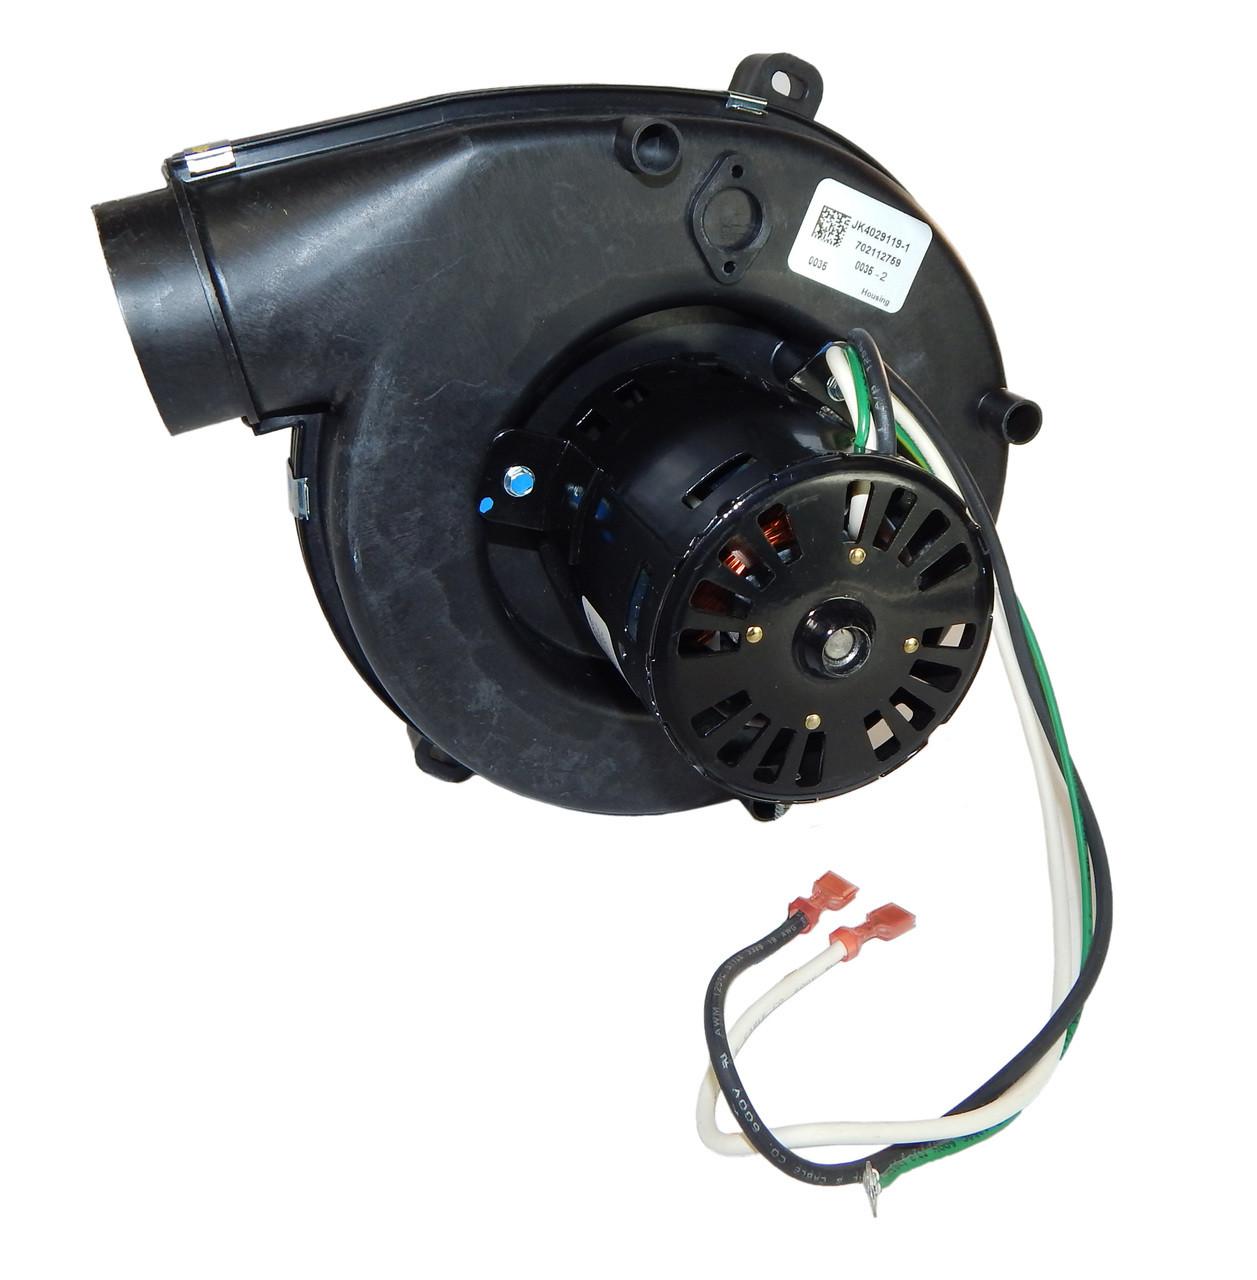 D9619_a__15668.1457533028.1280.1280?c=2 furnace blower motors furnace draft inducers venter motors  at nearapp.co